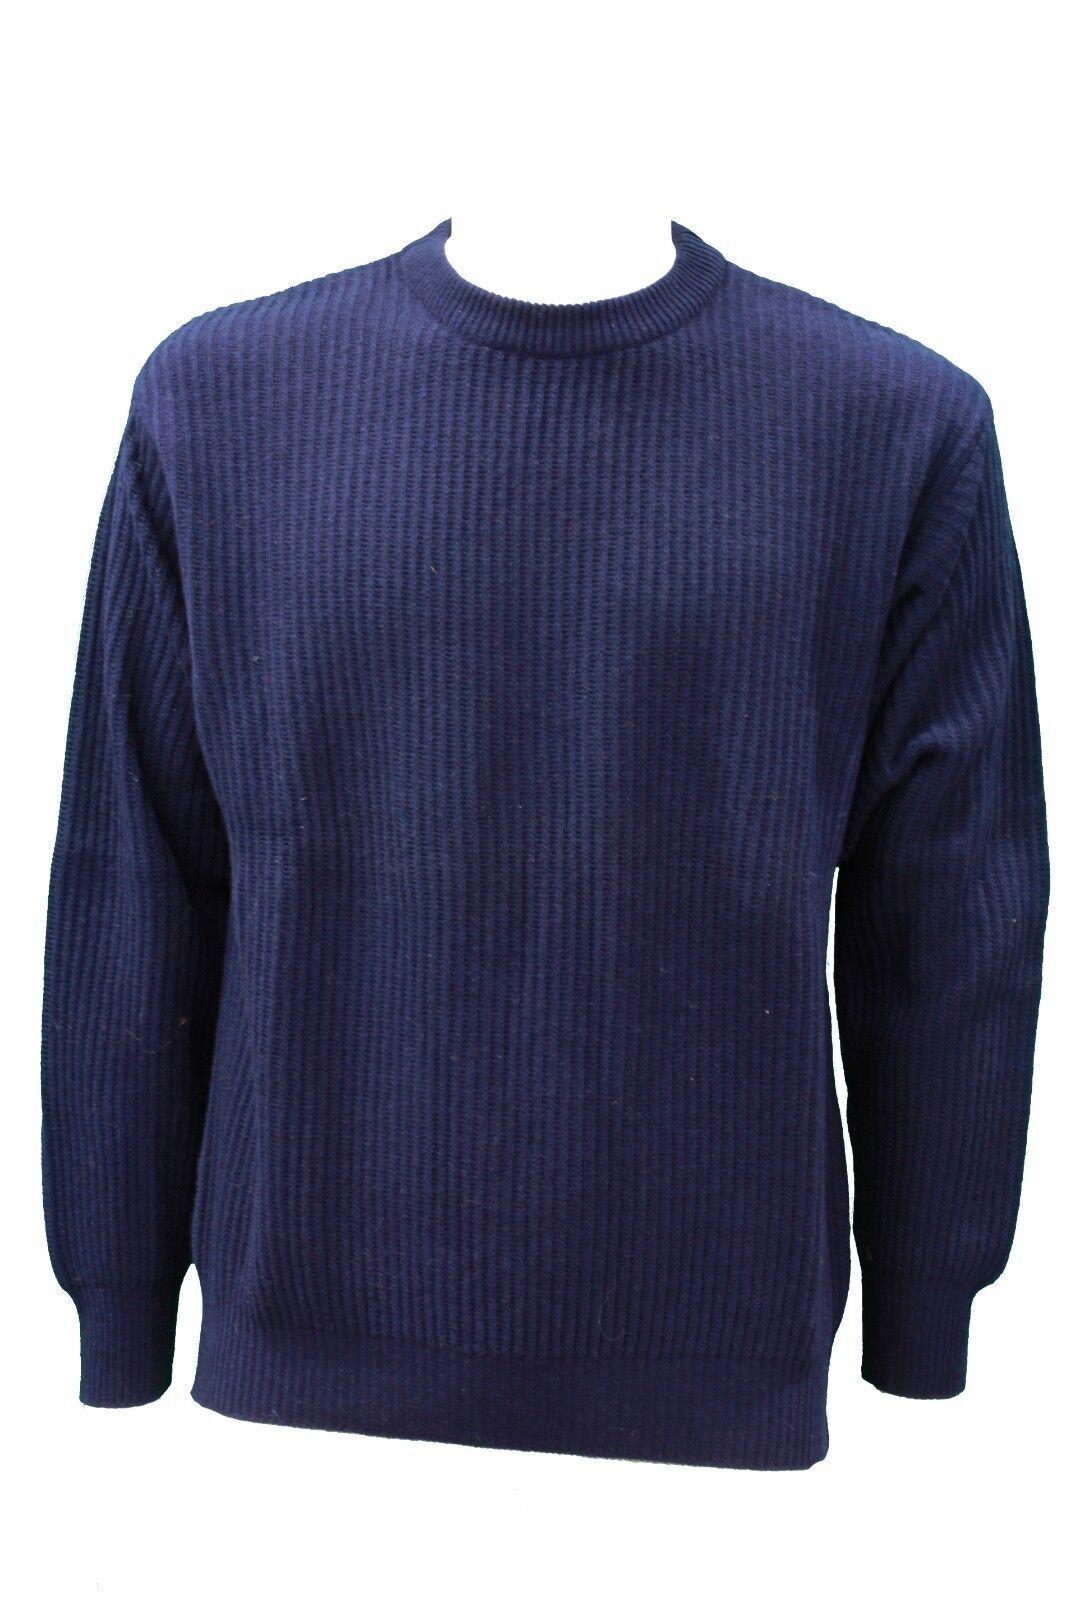 42 L 30 NUOVO Mac Jeans DREAM Straight Fit Stretch mezzi BLU BLUE STONE Tg